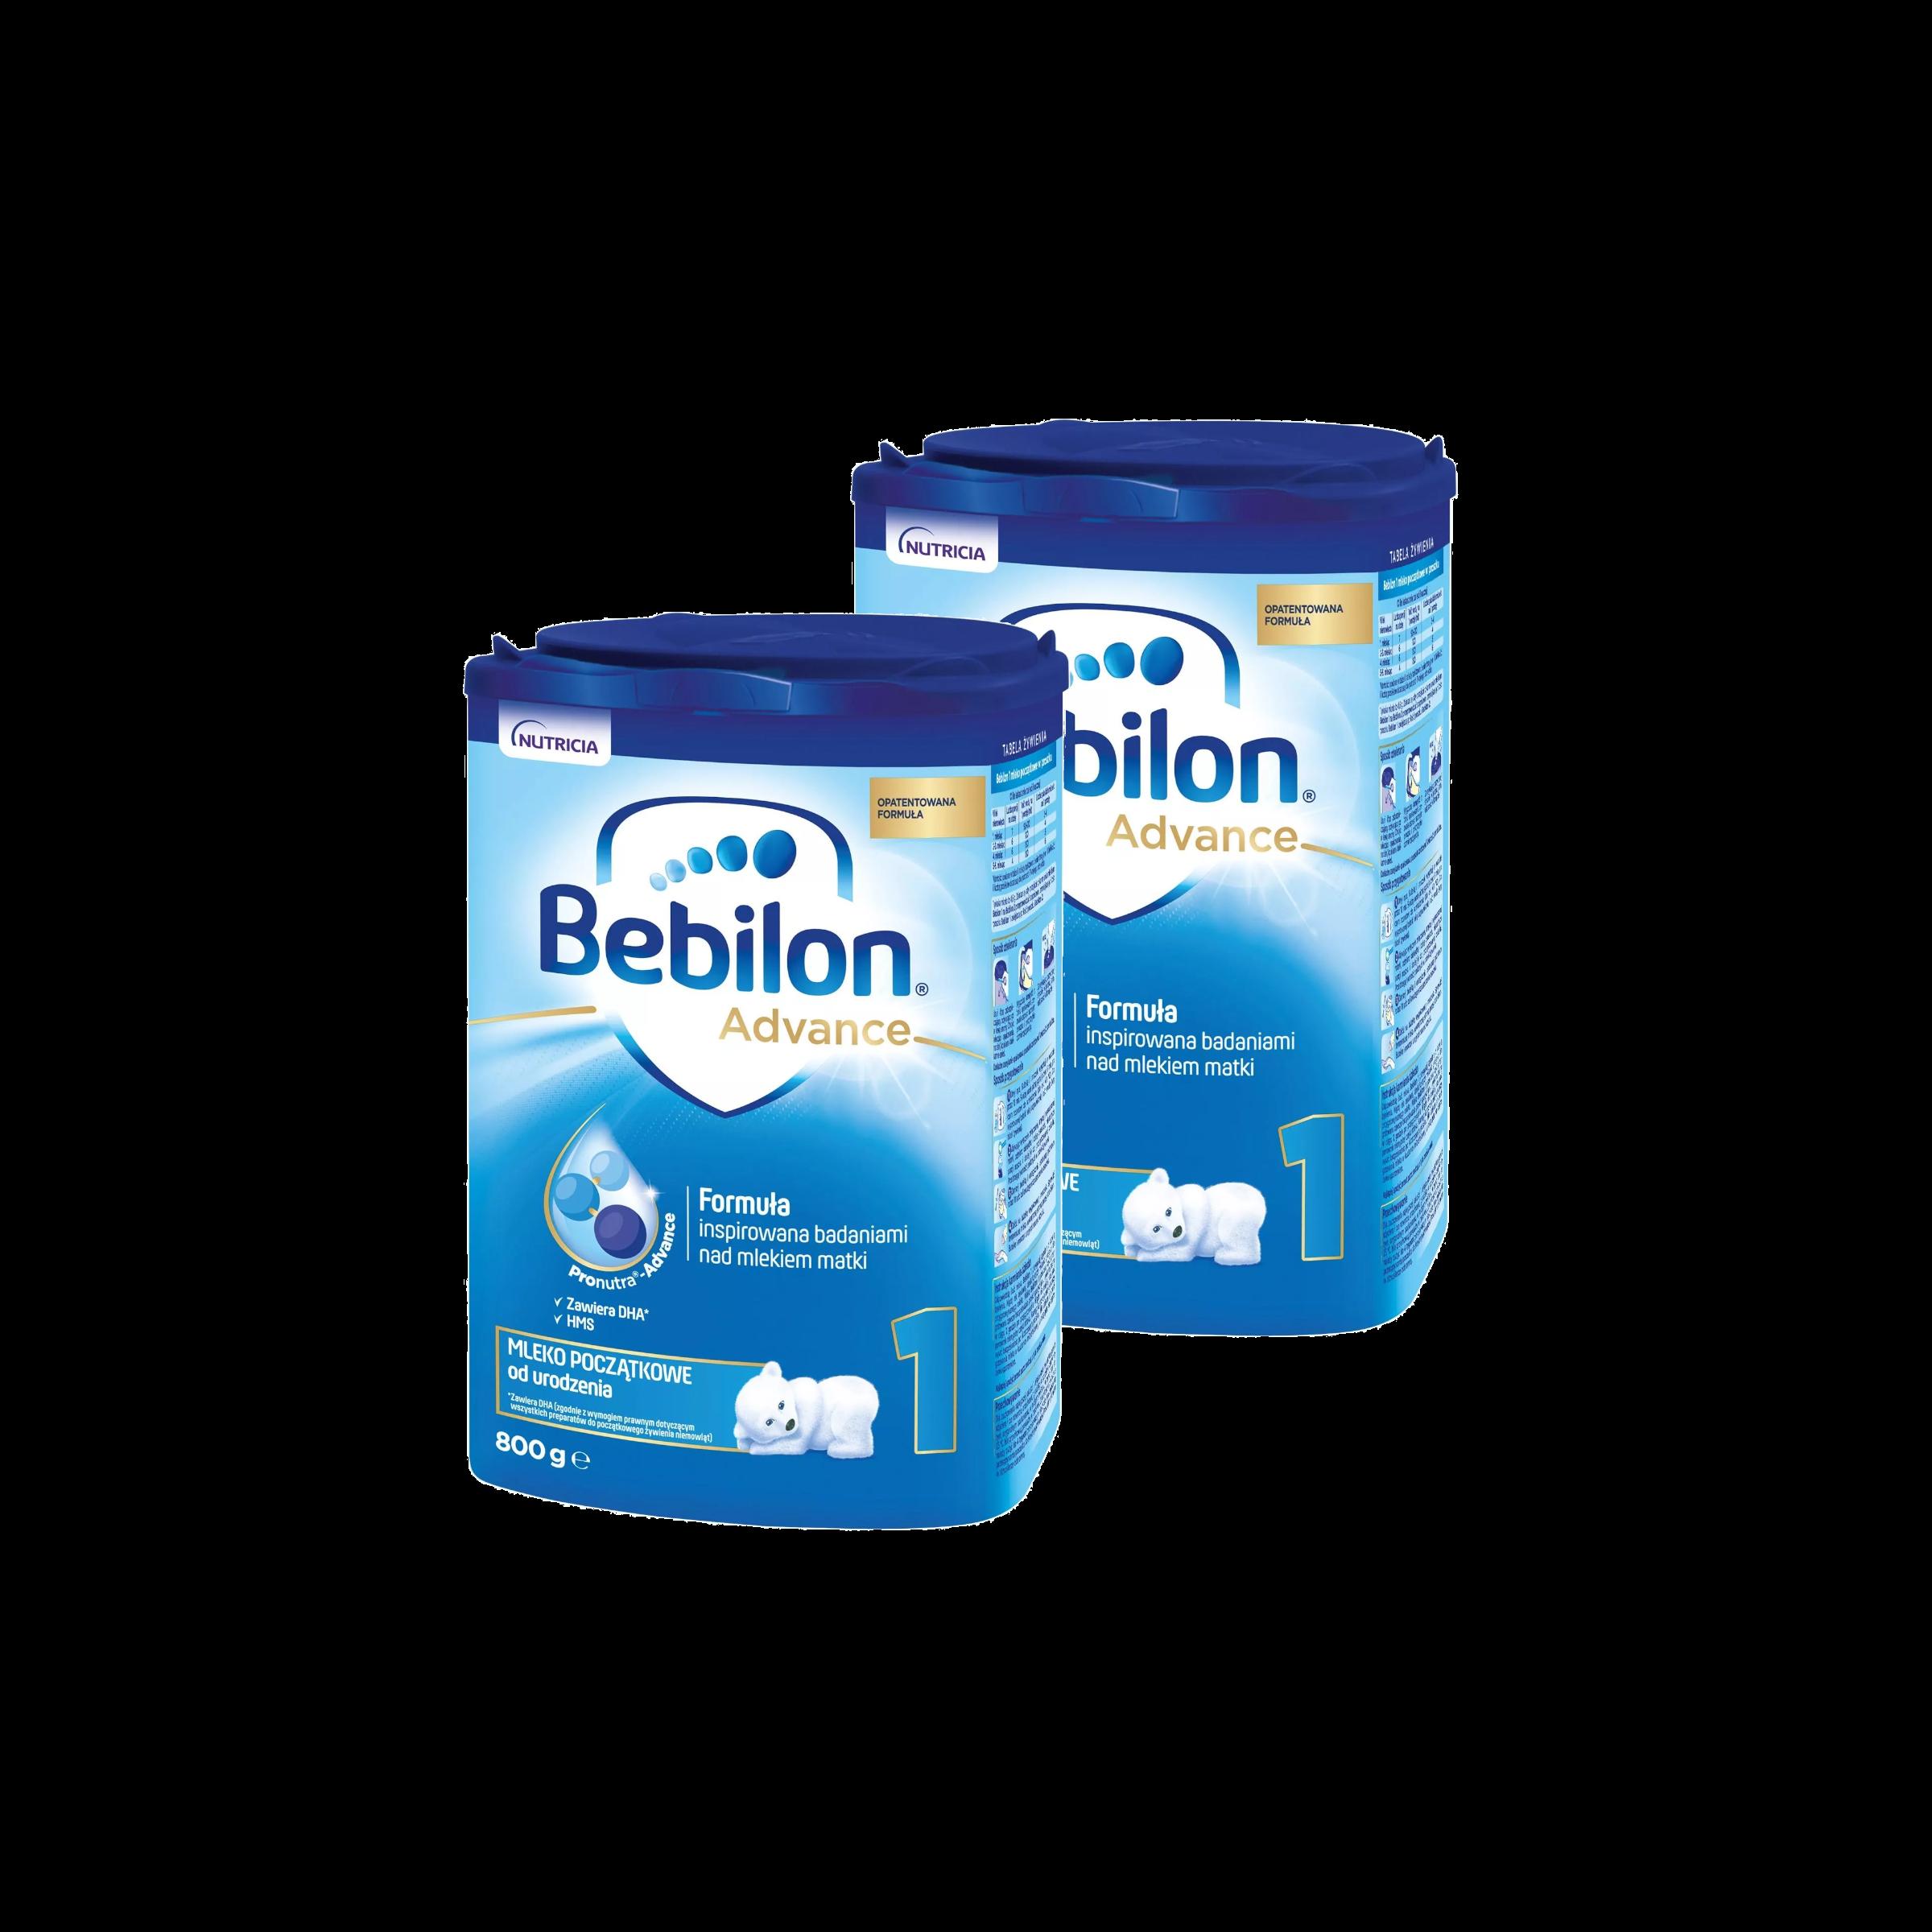 bebilon1_800_2pak